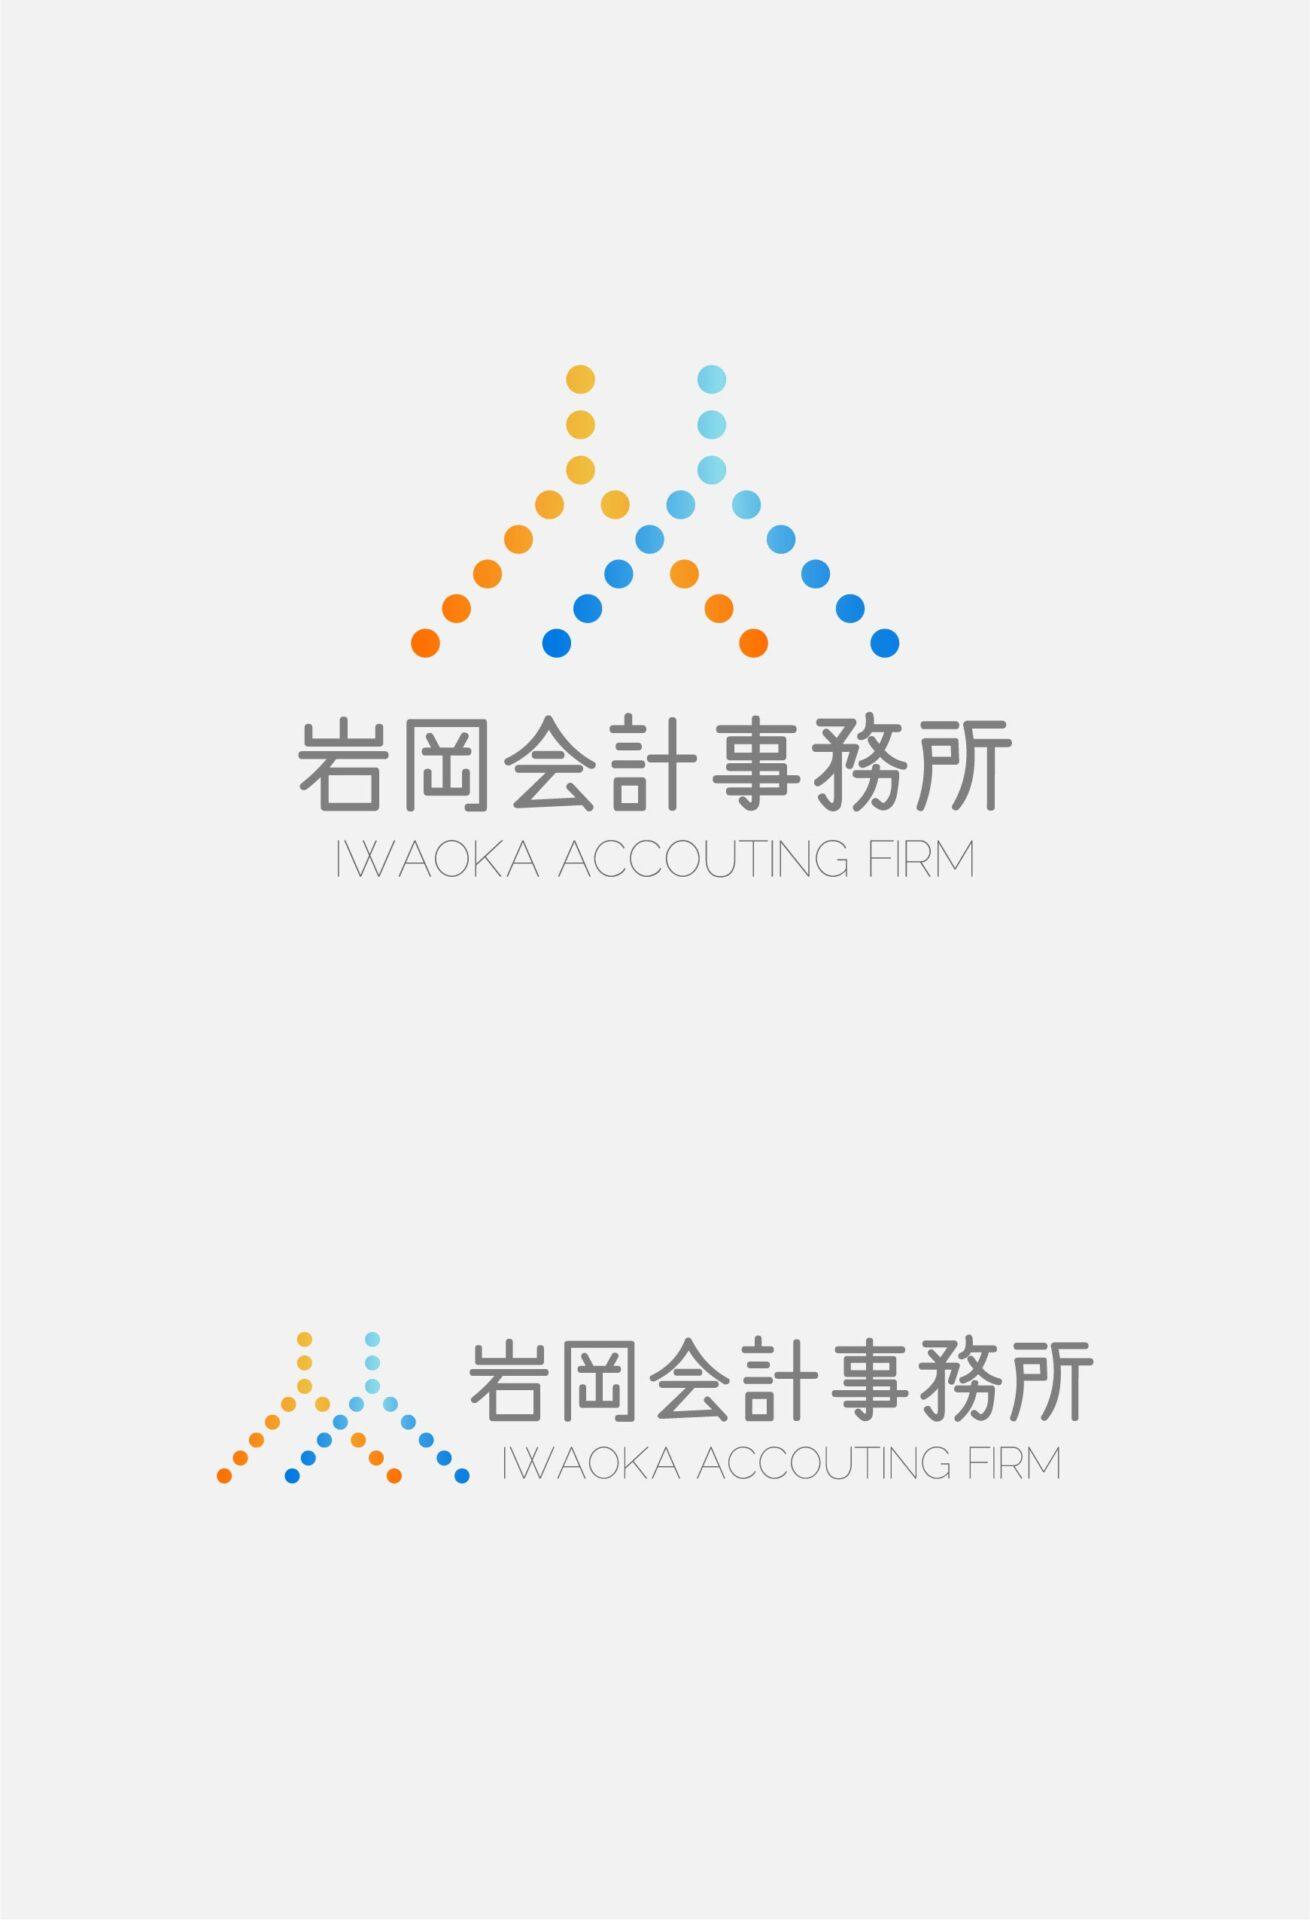 「IWAOKA ACCOUNTING FIRM」の実績画像